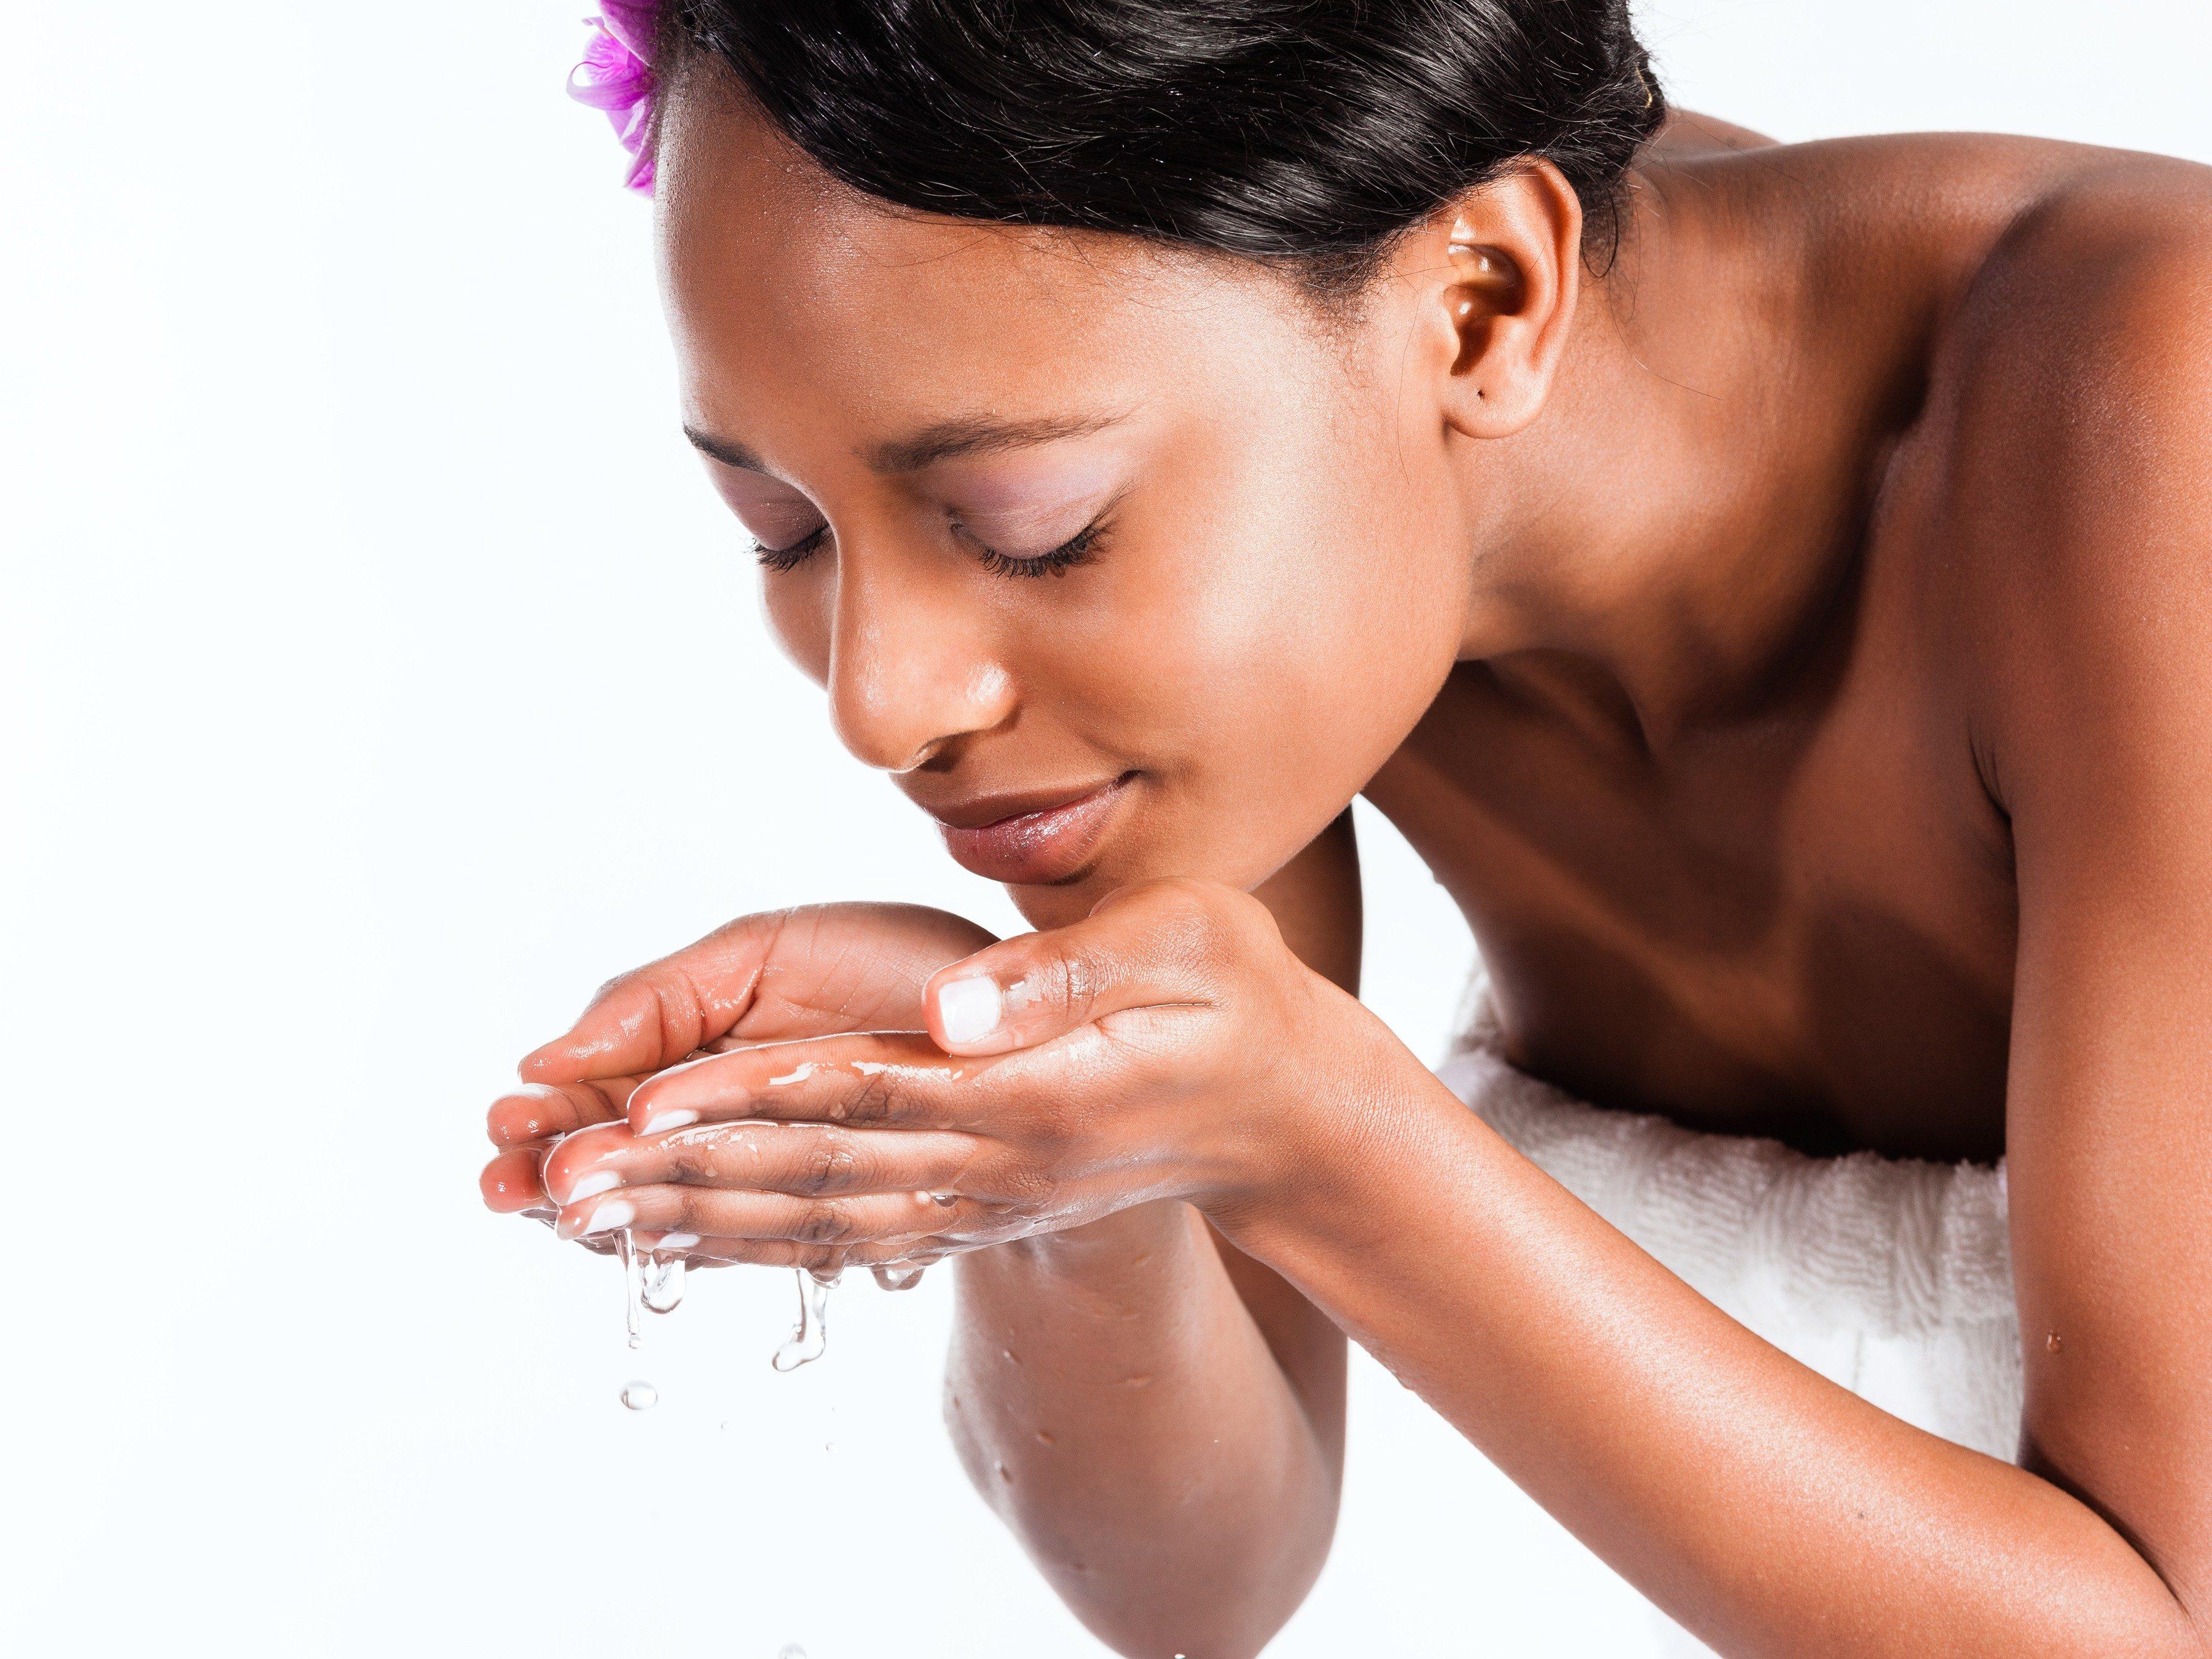 9. Gentle skin care